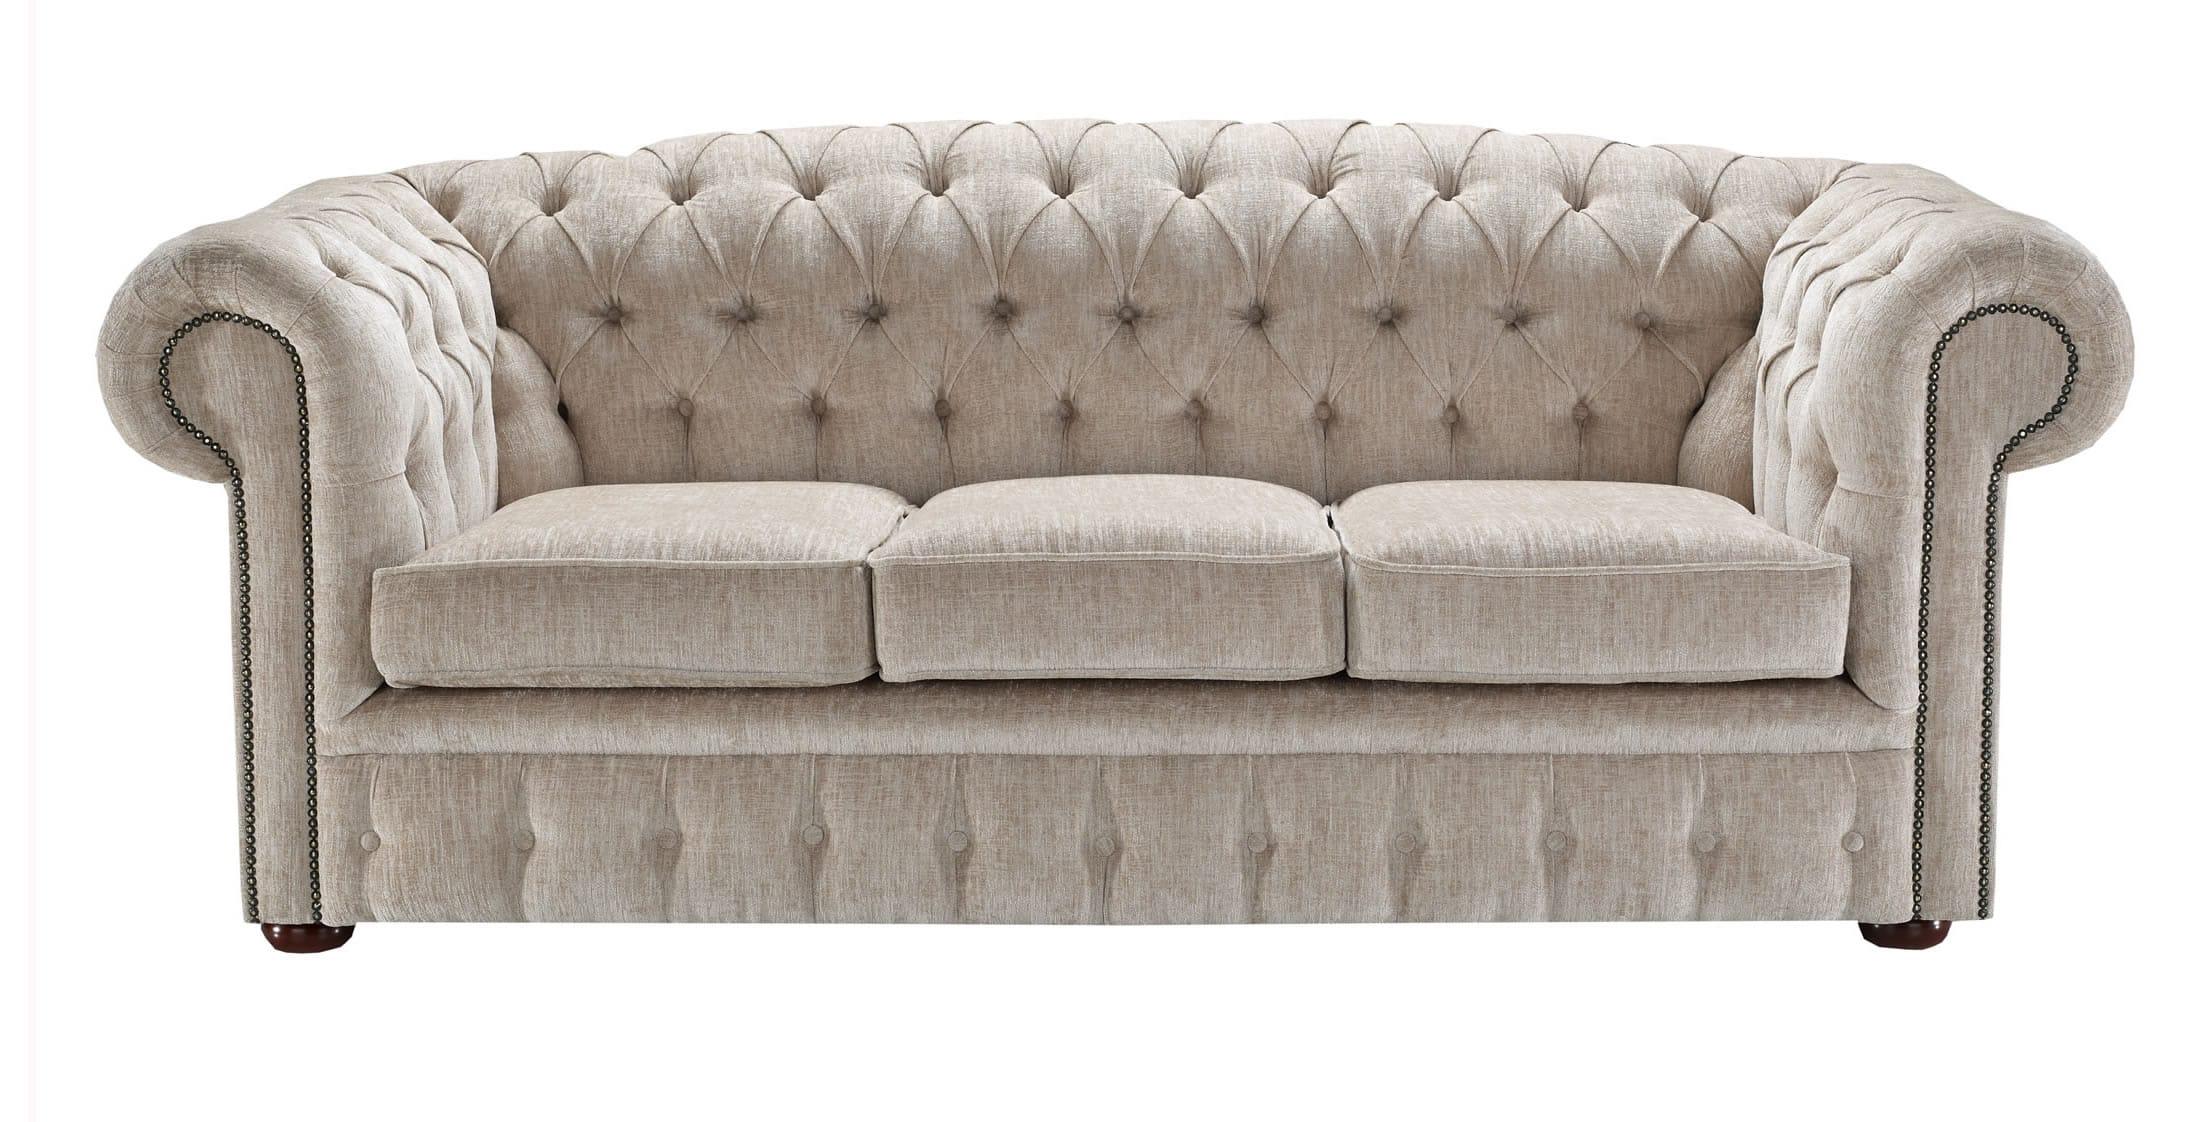 Luxury Cream Chenille Fabric Sample chenille fabric sofa